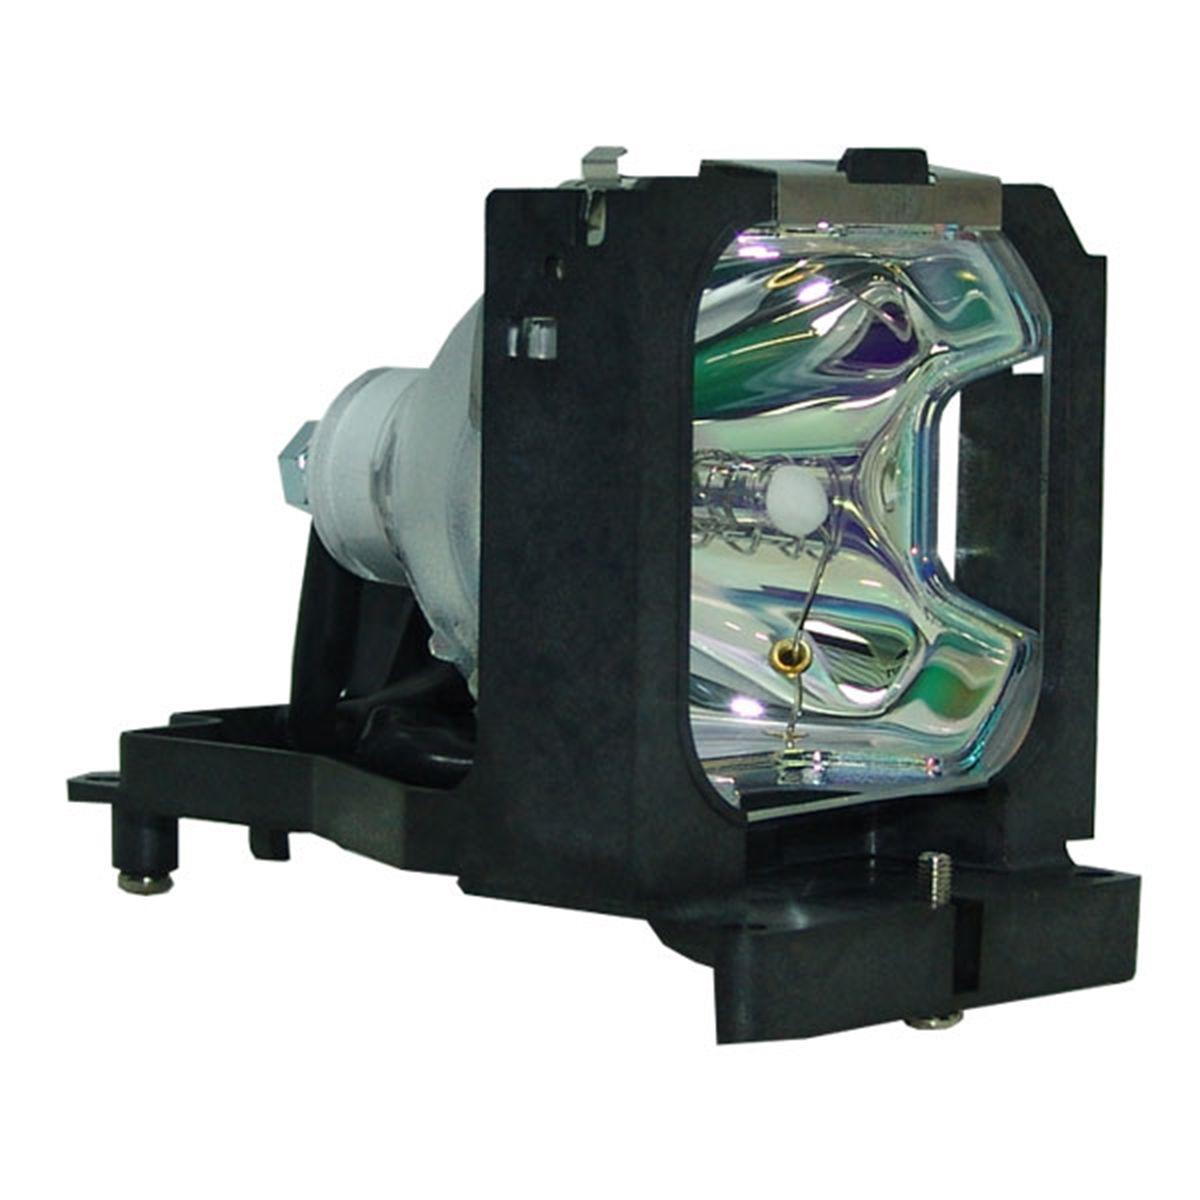 Projector Lamp Bulb POA-LMP86 LMP86 610-317-5355 for SANYO PLV-Z1X PLV-Z3 with housing projector lamp lmp86 without housing for plv z1x z3 sanyo